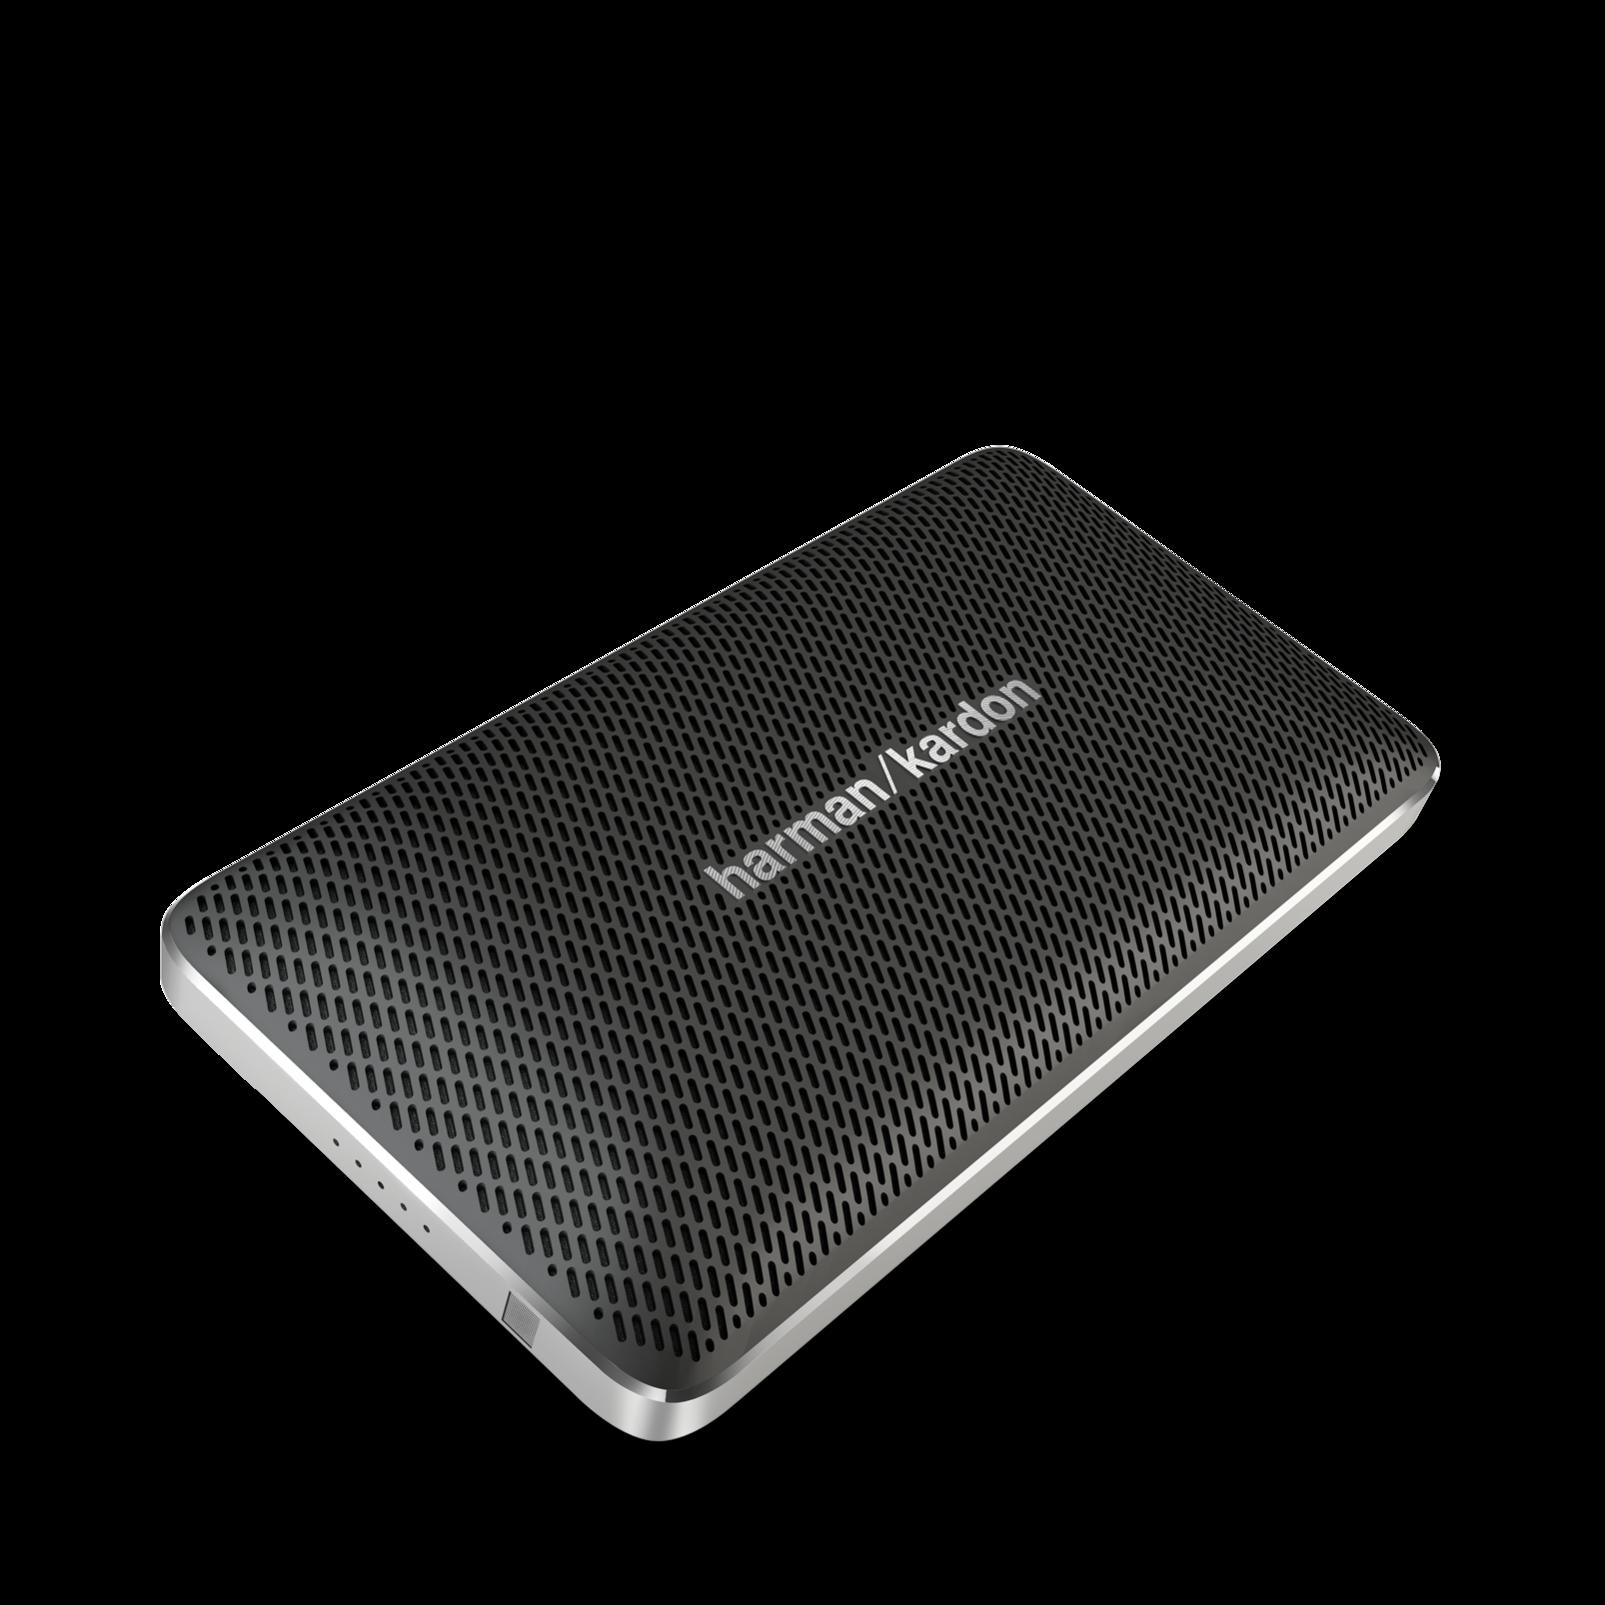 Esquire Mini - Black - Wireless, portable speaker and conferencing system - Hero